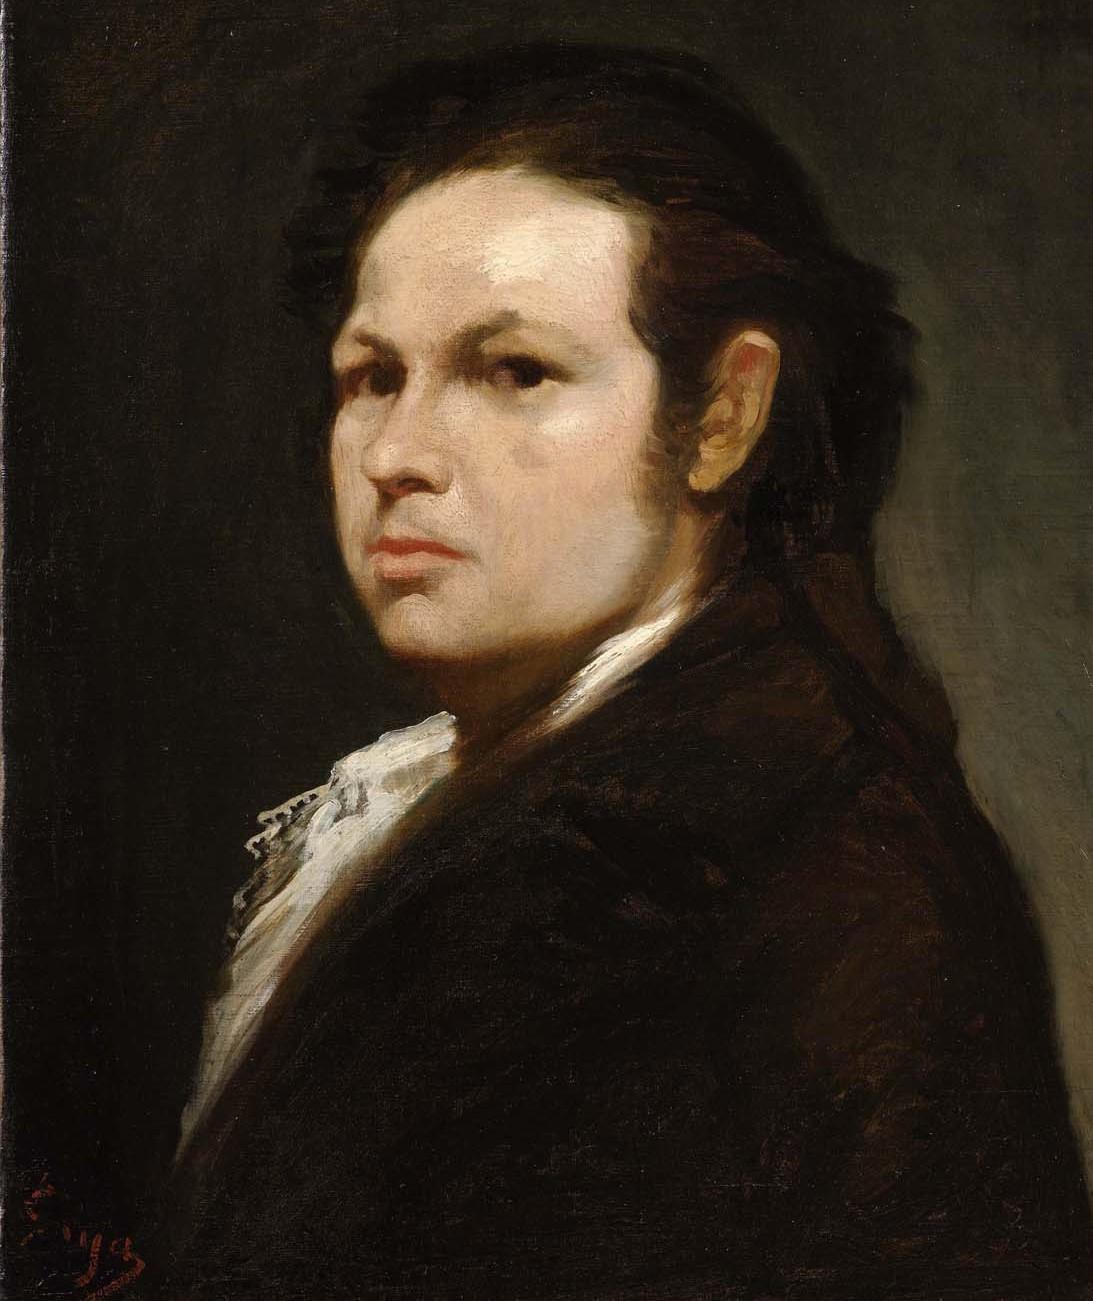 Goya Autoritratto